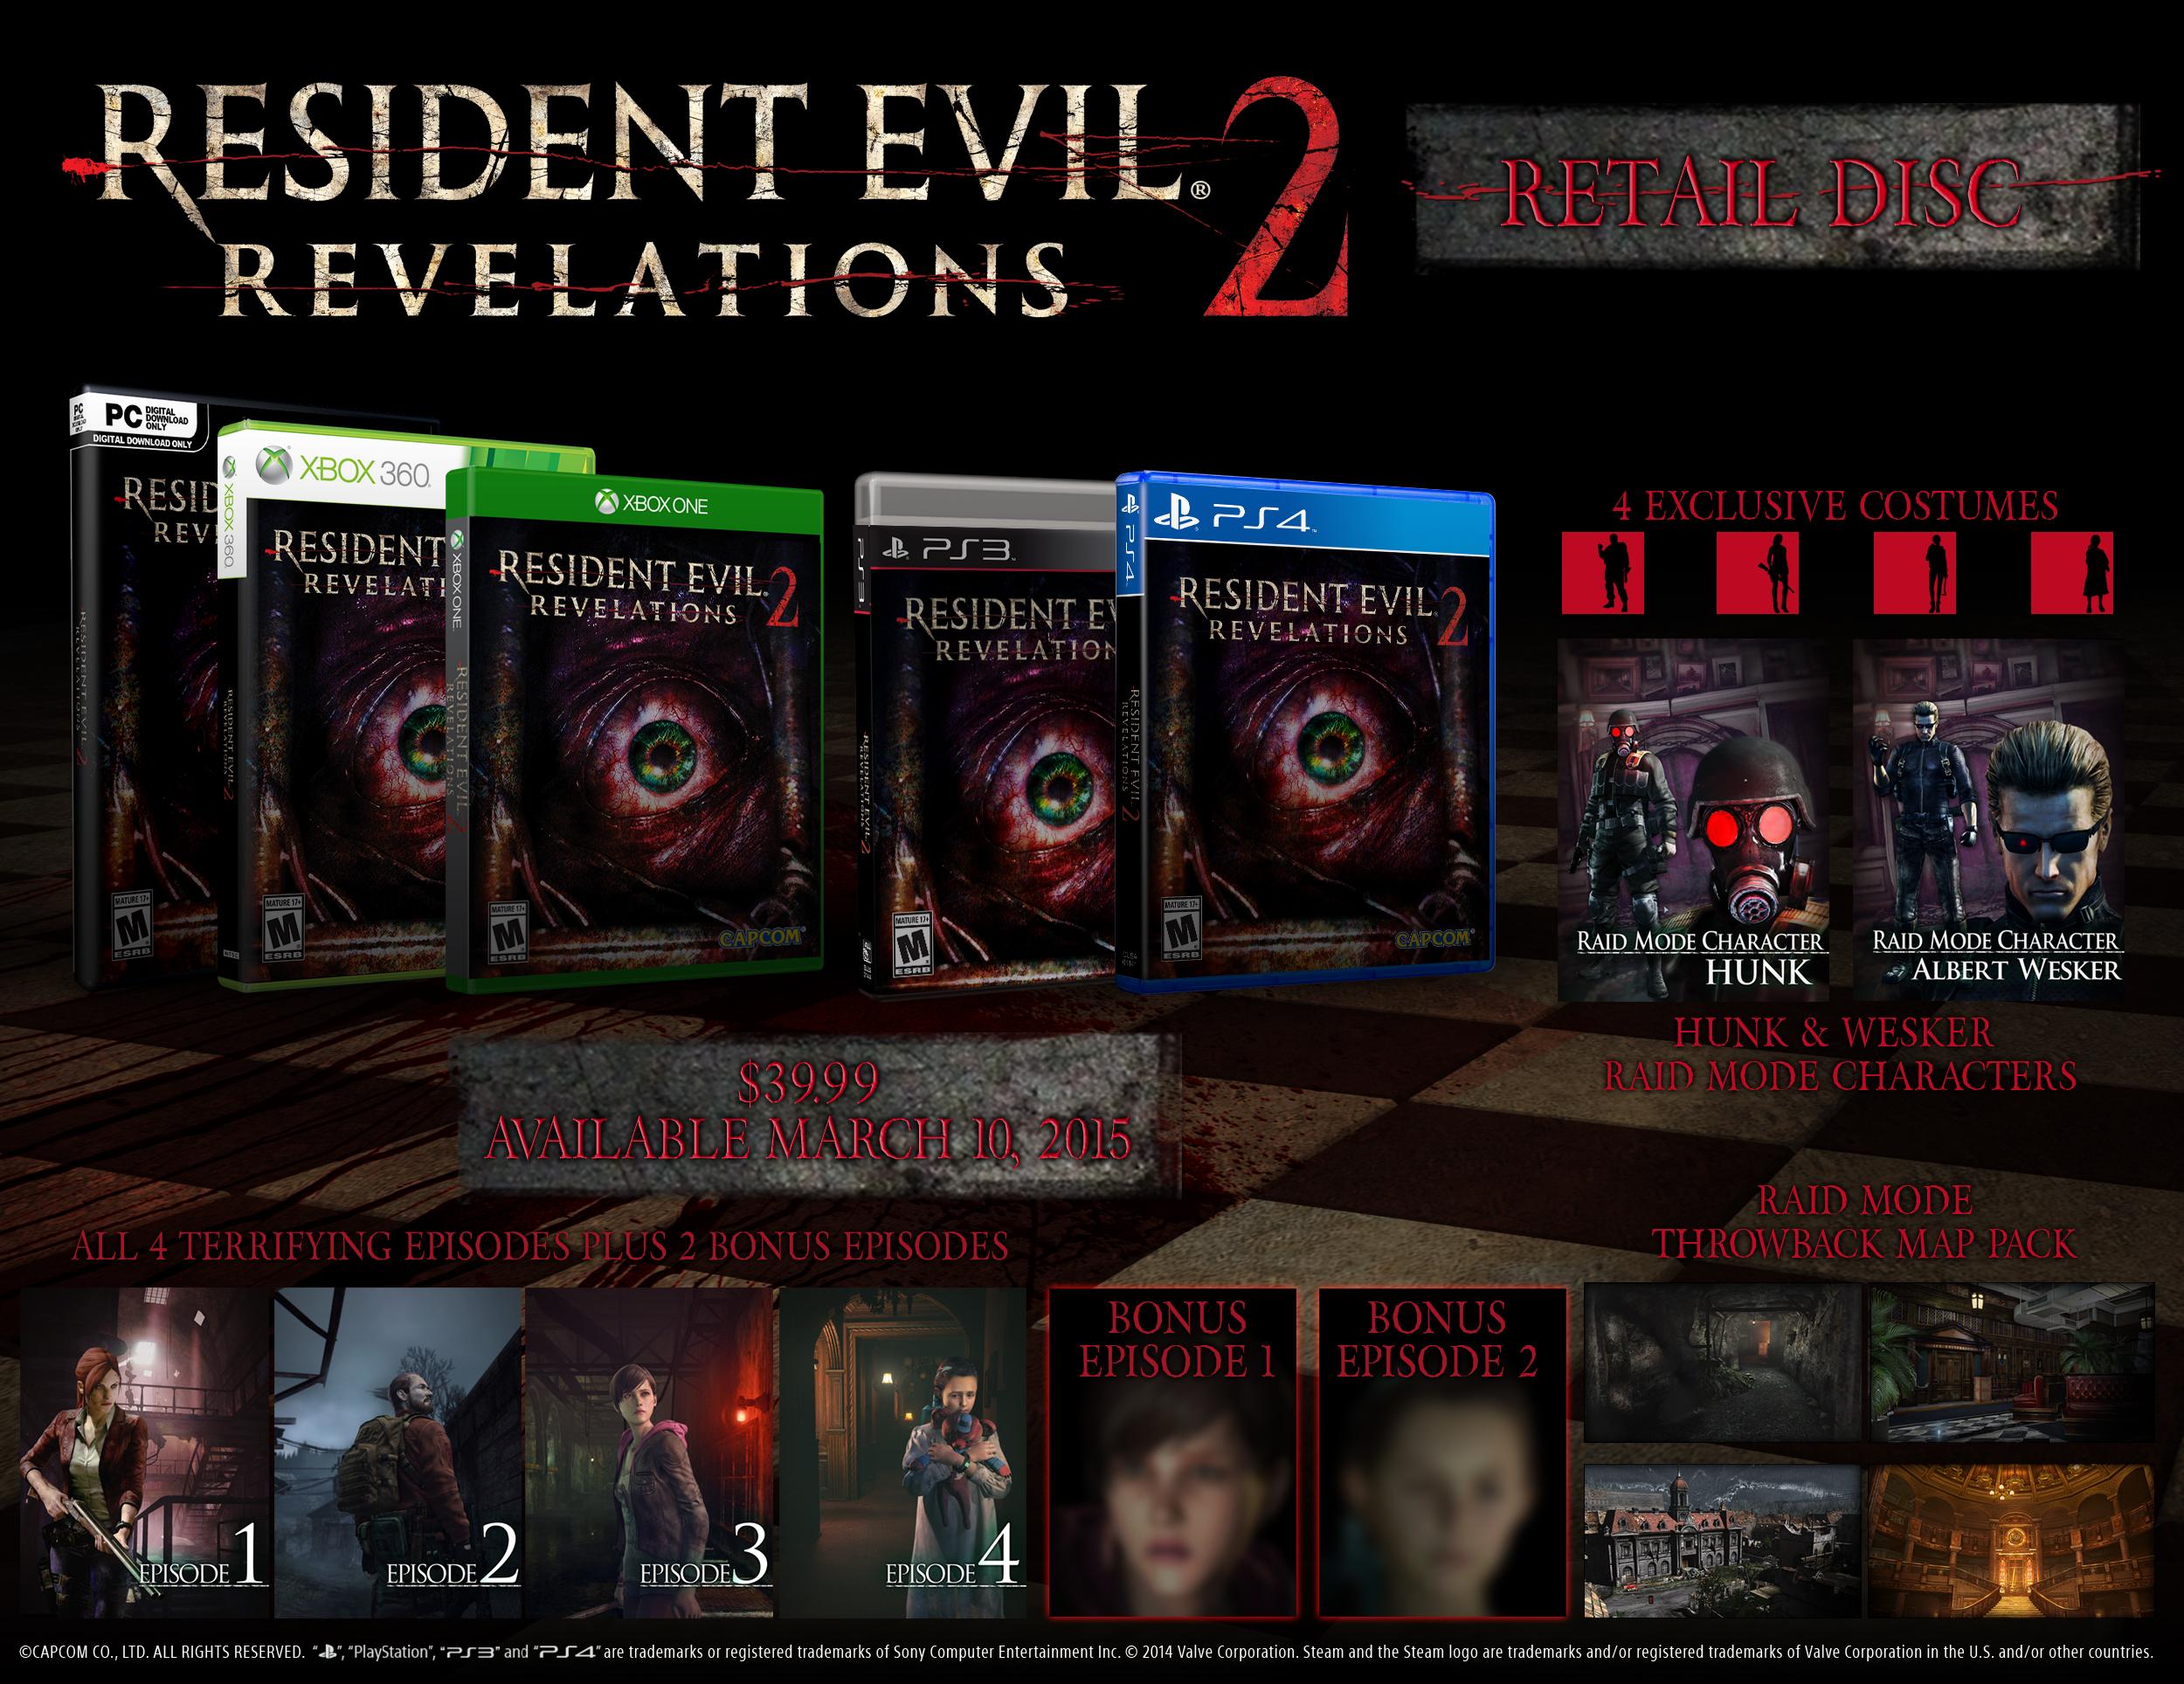 Resident-Evil-revelations-2-retail-beauty-updated